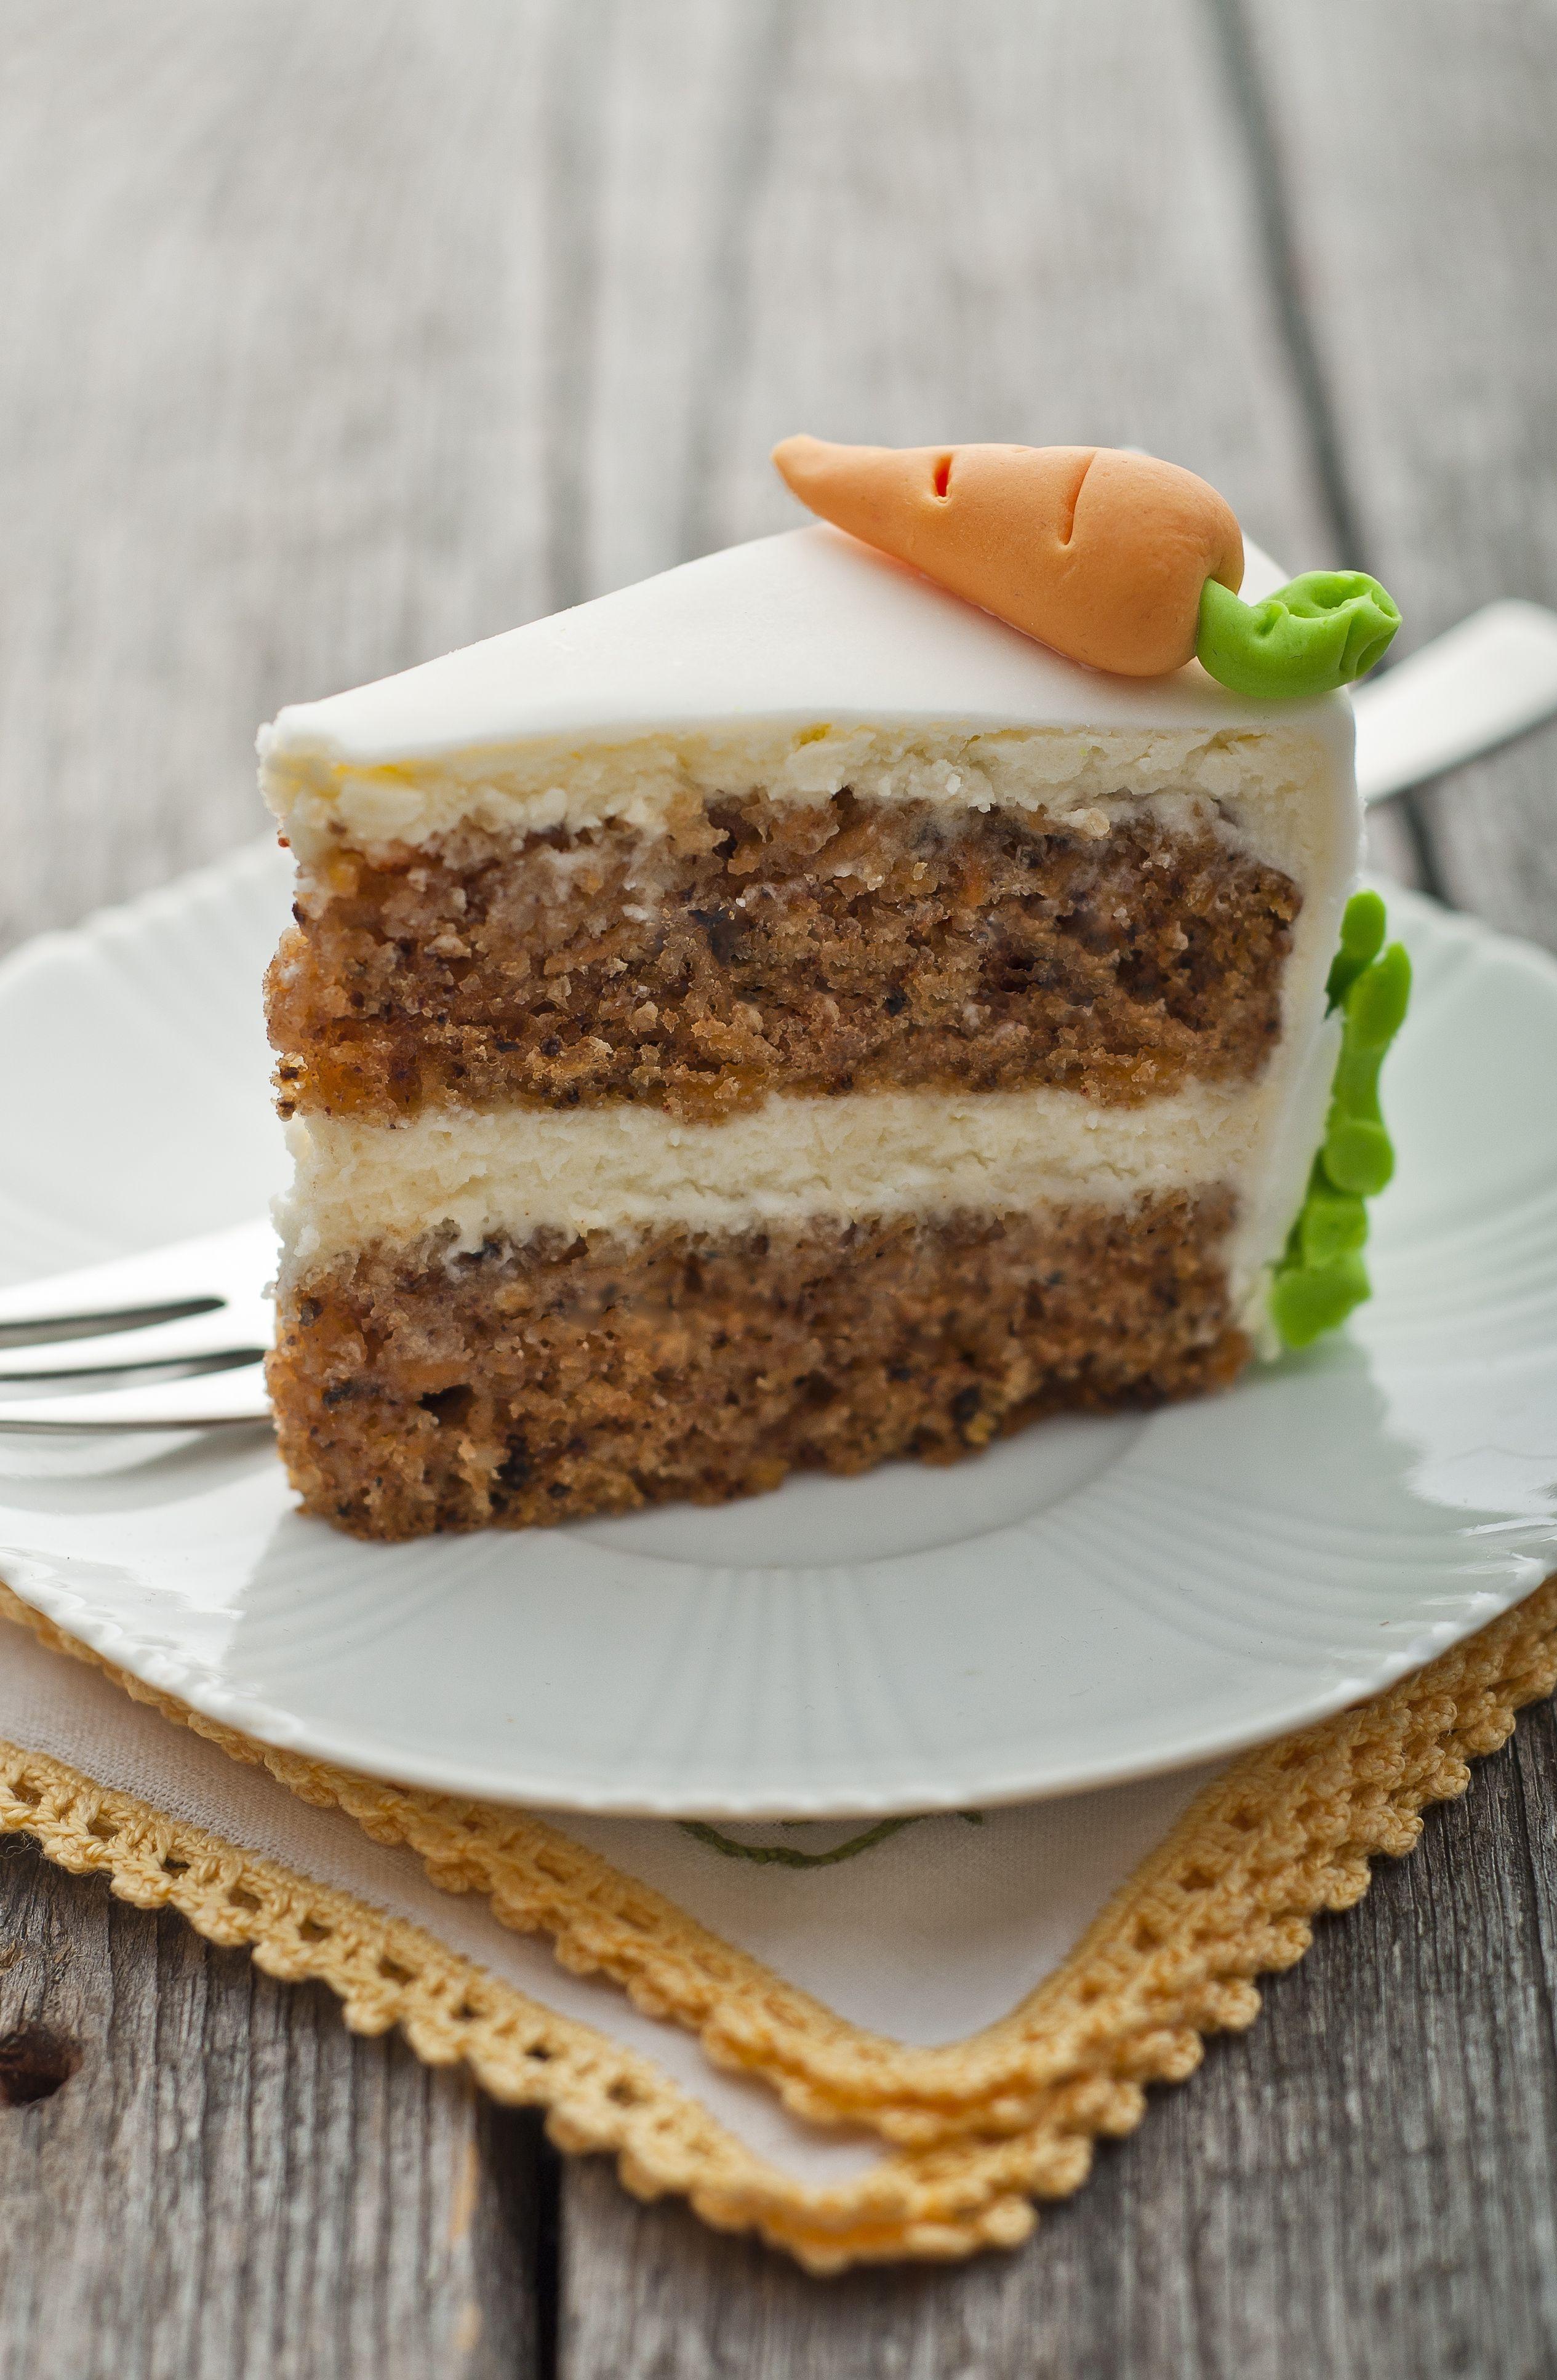 Classic Dessert Recipe: Carrot Cake - 12 Tomatoes